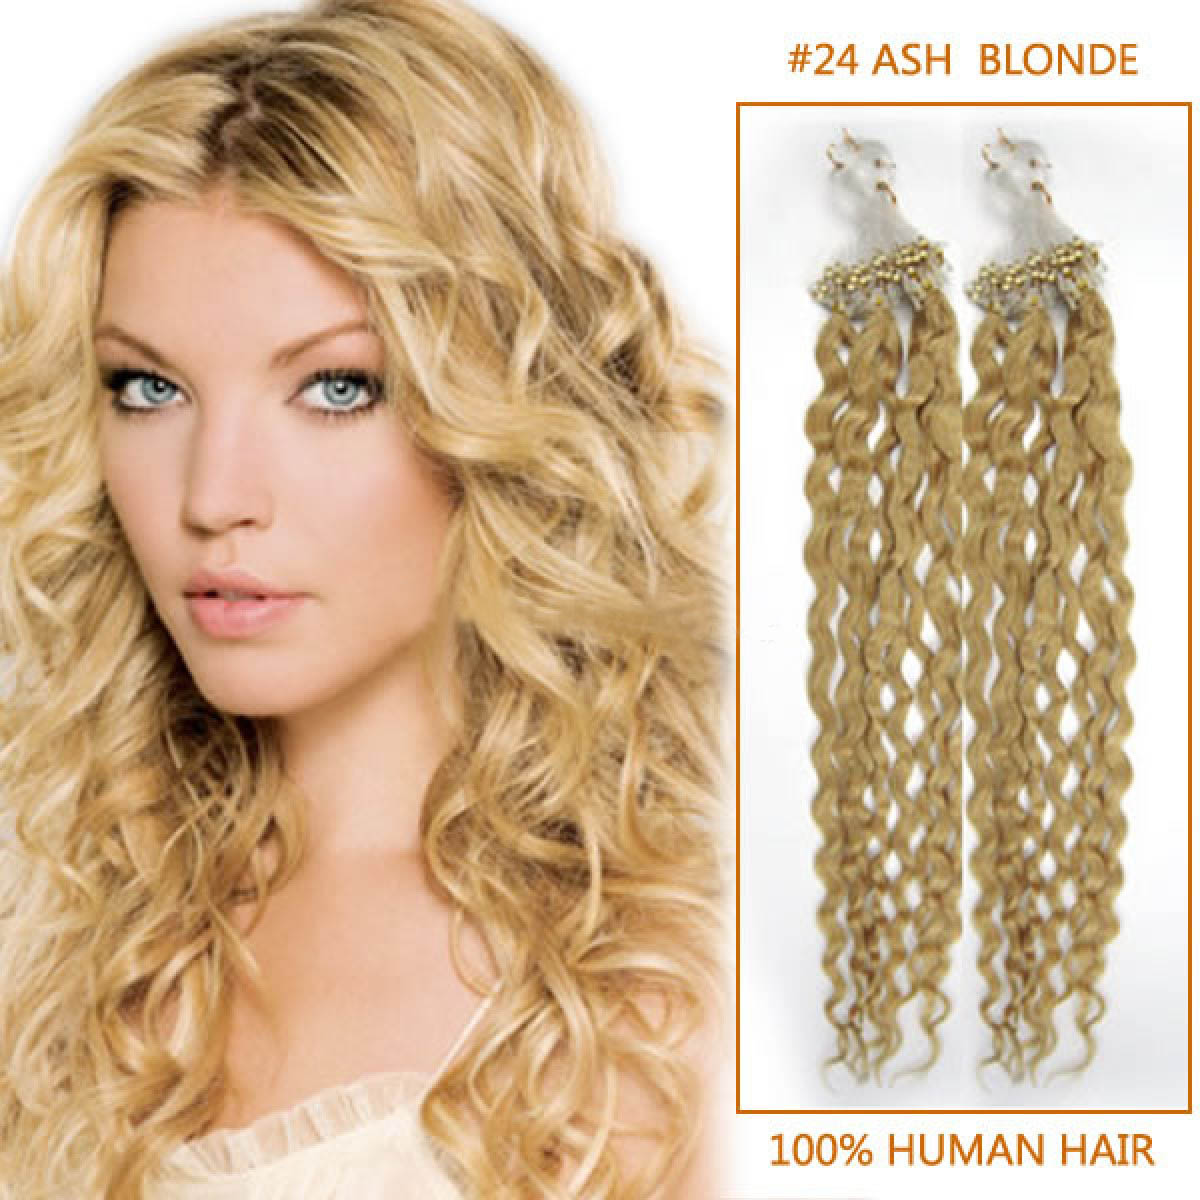 30 Inch Lustrous 24 Ash Blonde Curly Micro Loop Hair Extensions 100